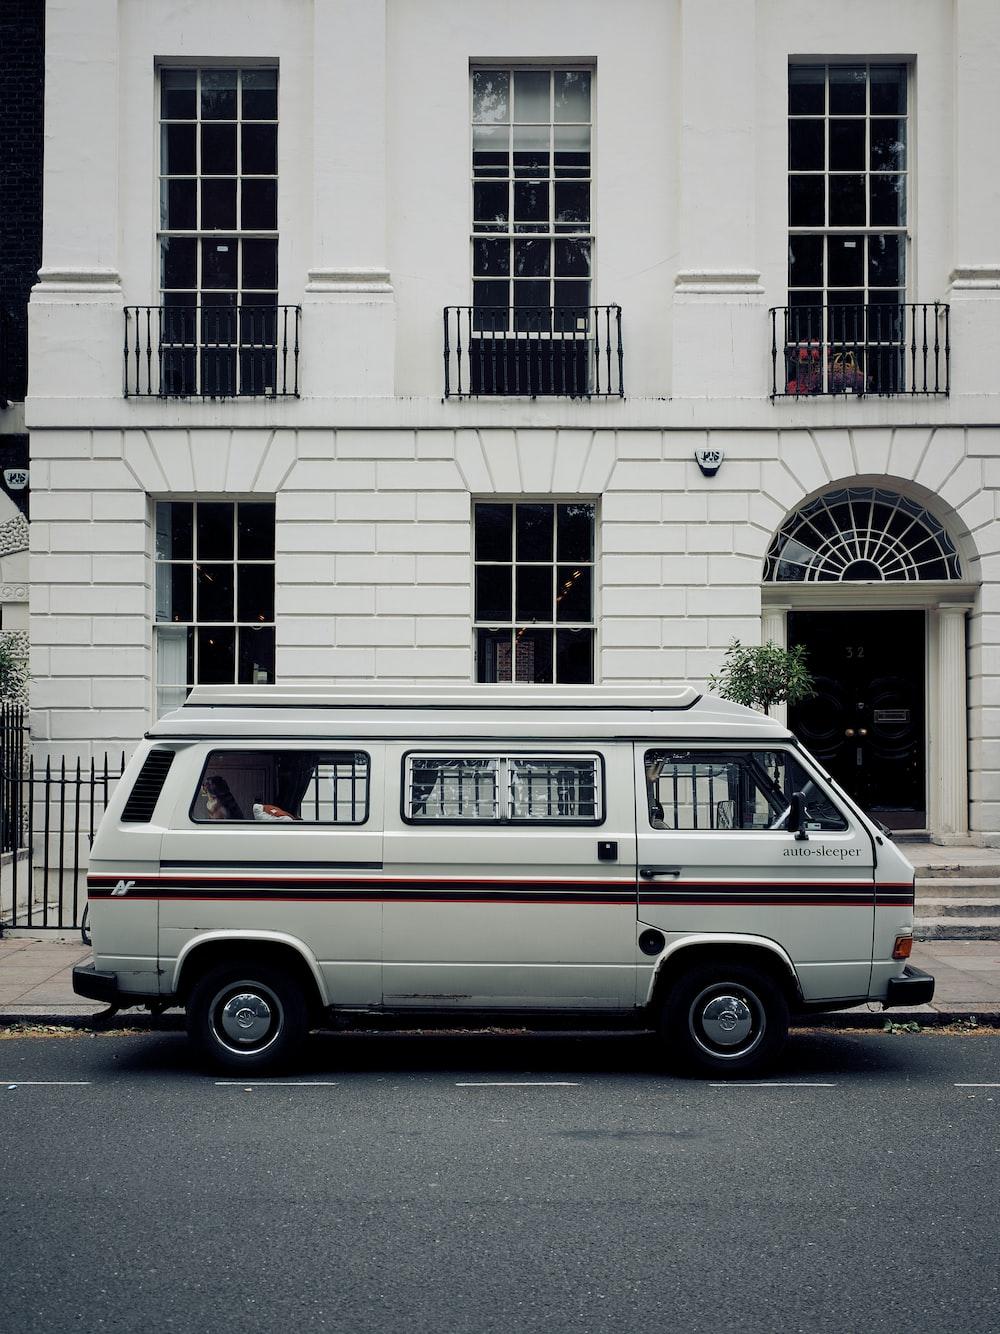 white and brown van